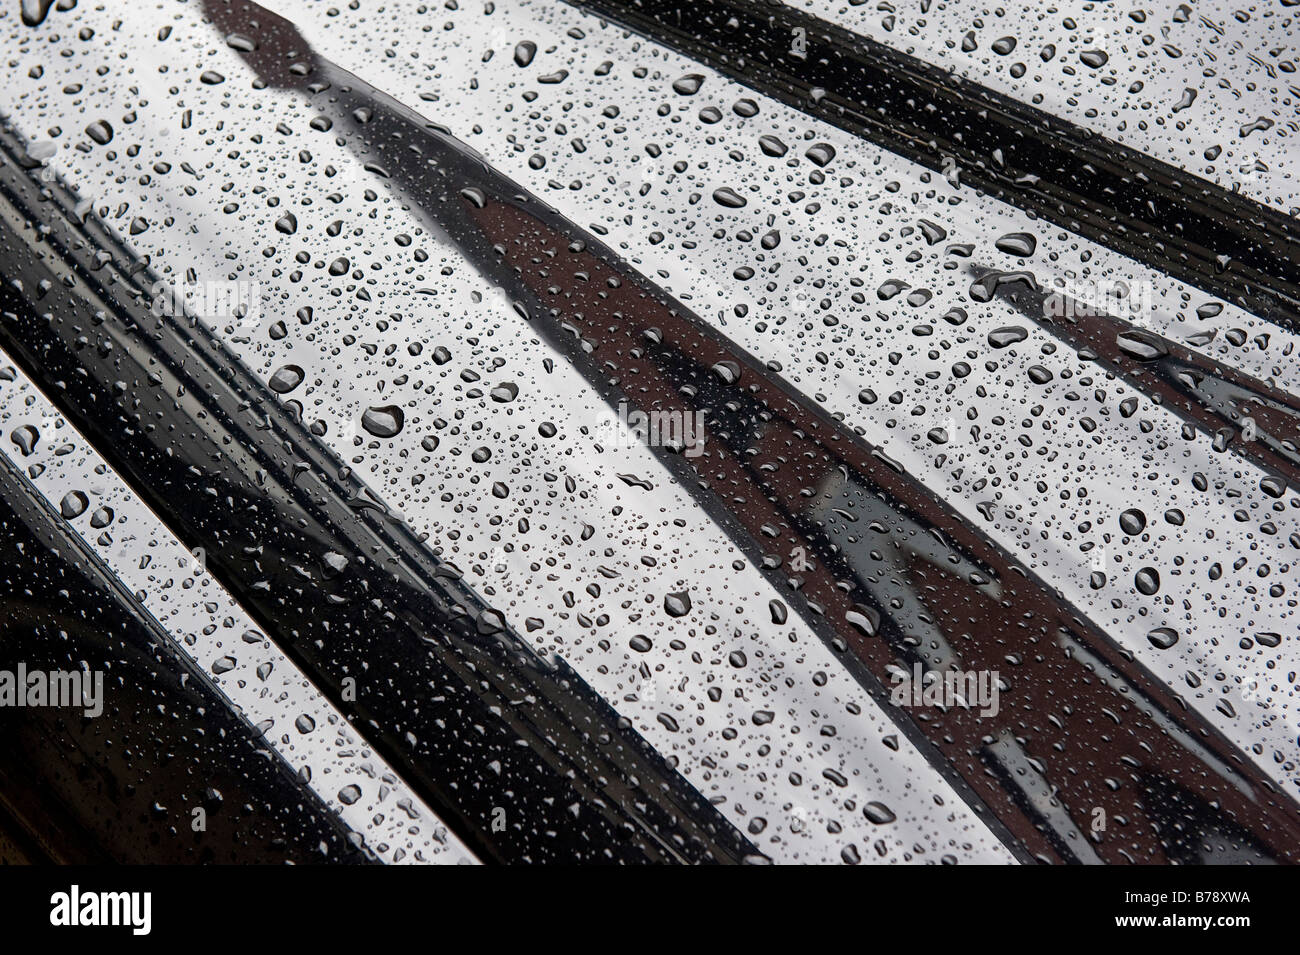 Drops of water on car bodywork, Stuttgart, Baden-Wuerttemberg, Southern Germany, Europe Stock Photo